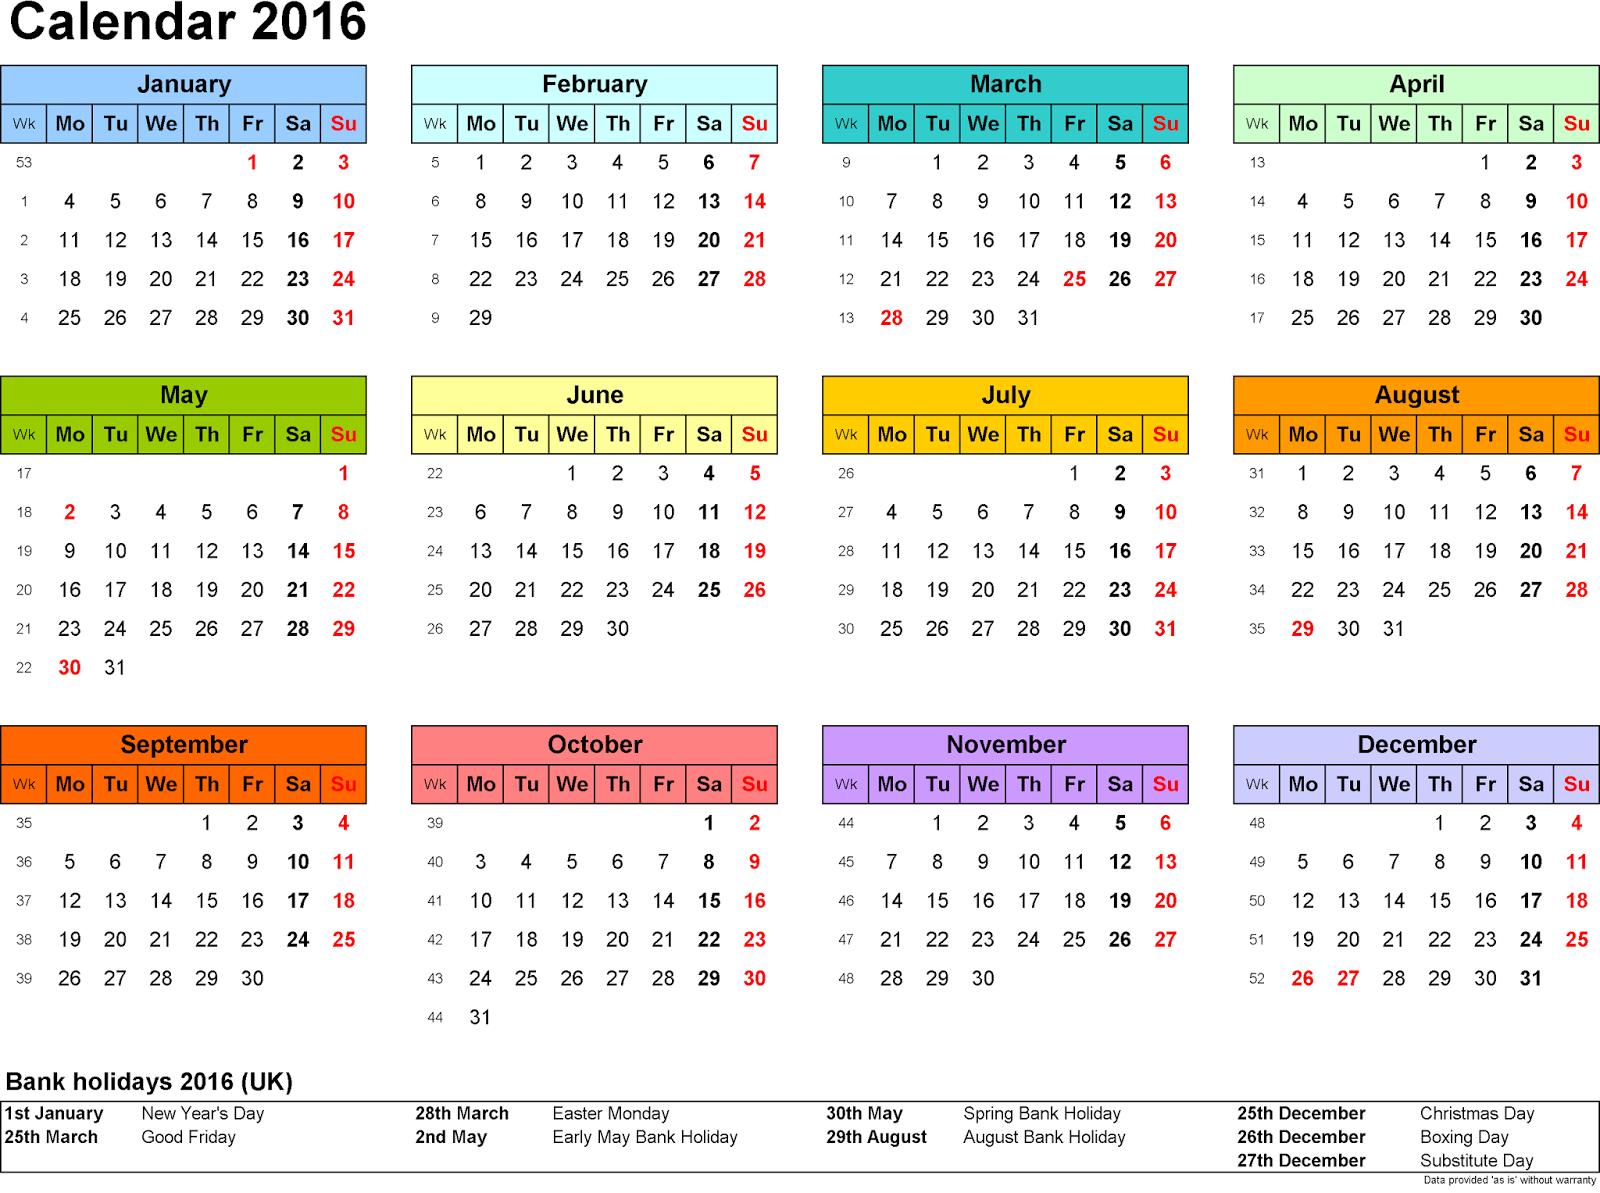 Calendar Bank Holidays : Calendar with federal bank holidays